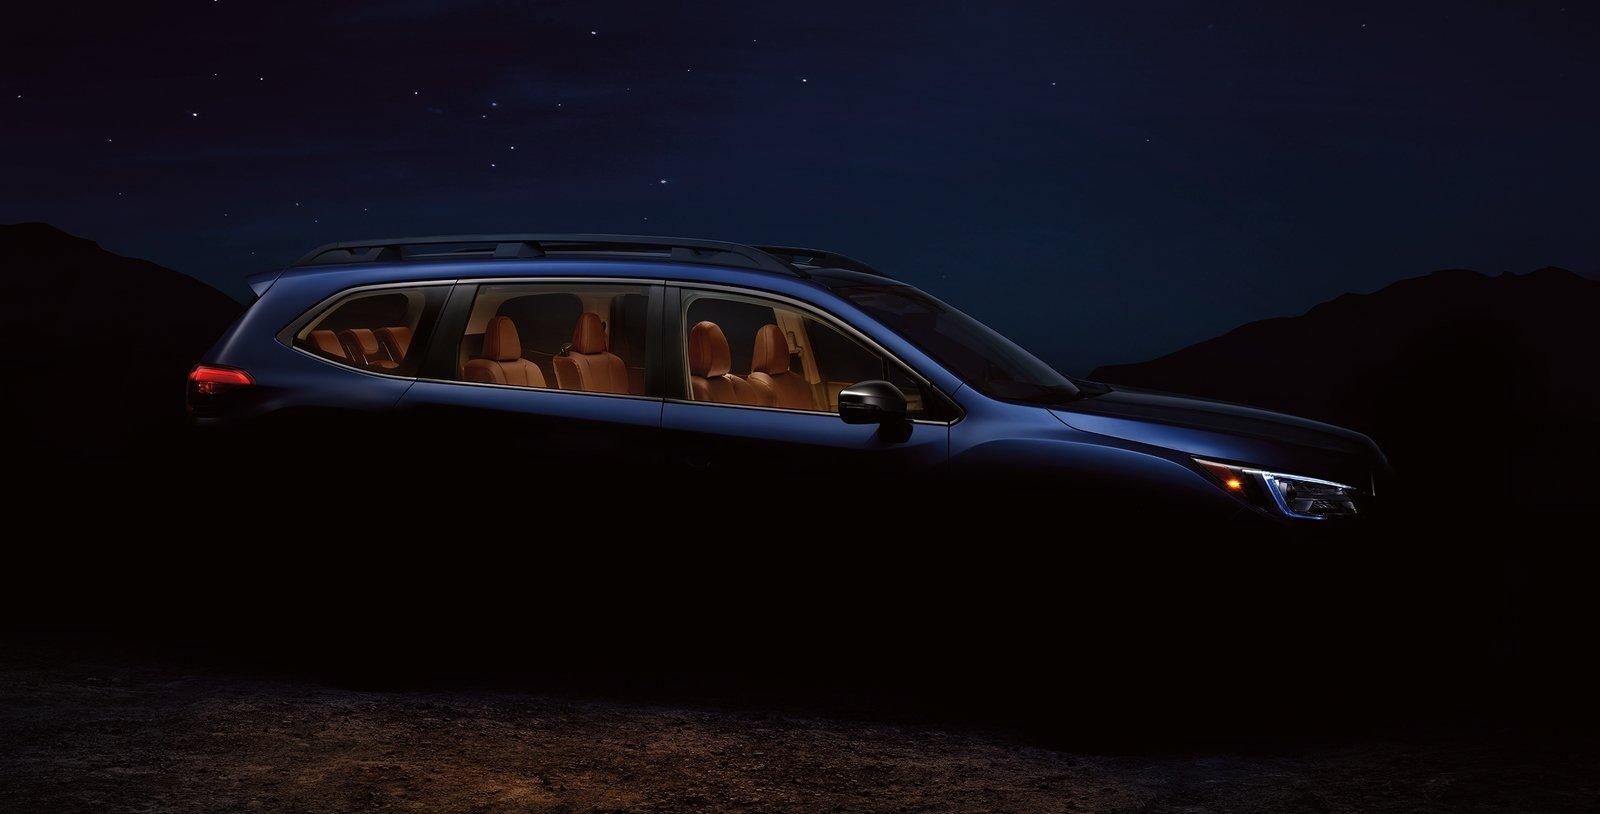 2019 Subaru Ascent - Biggest Subaru SUV Is Here